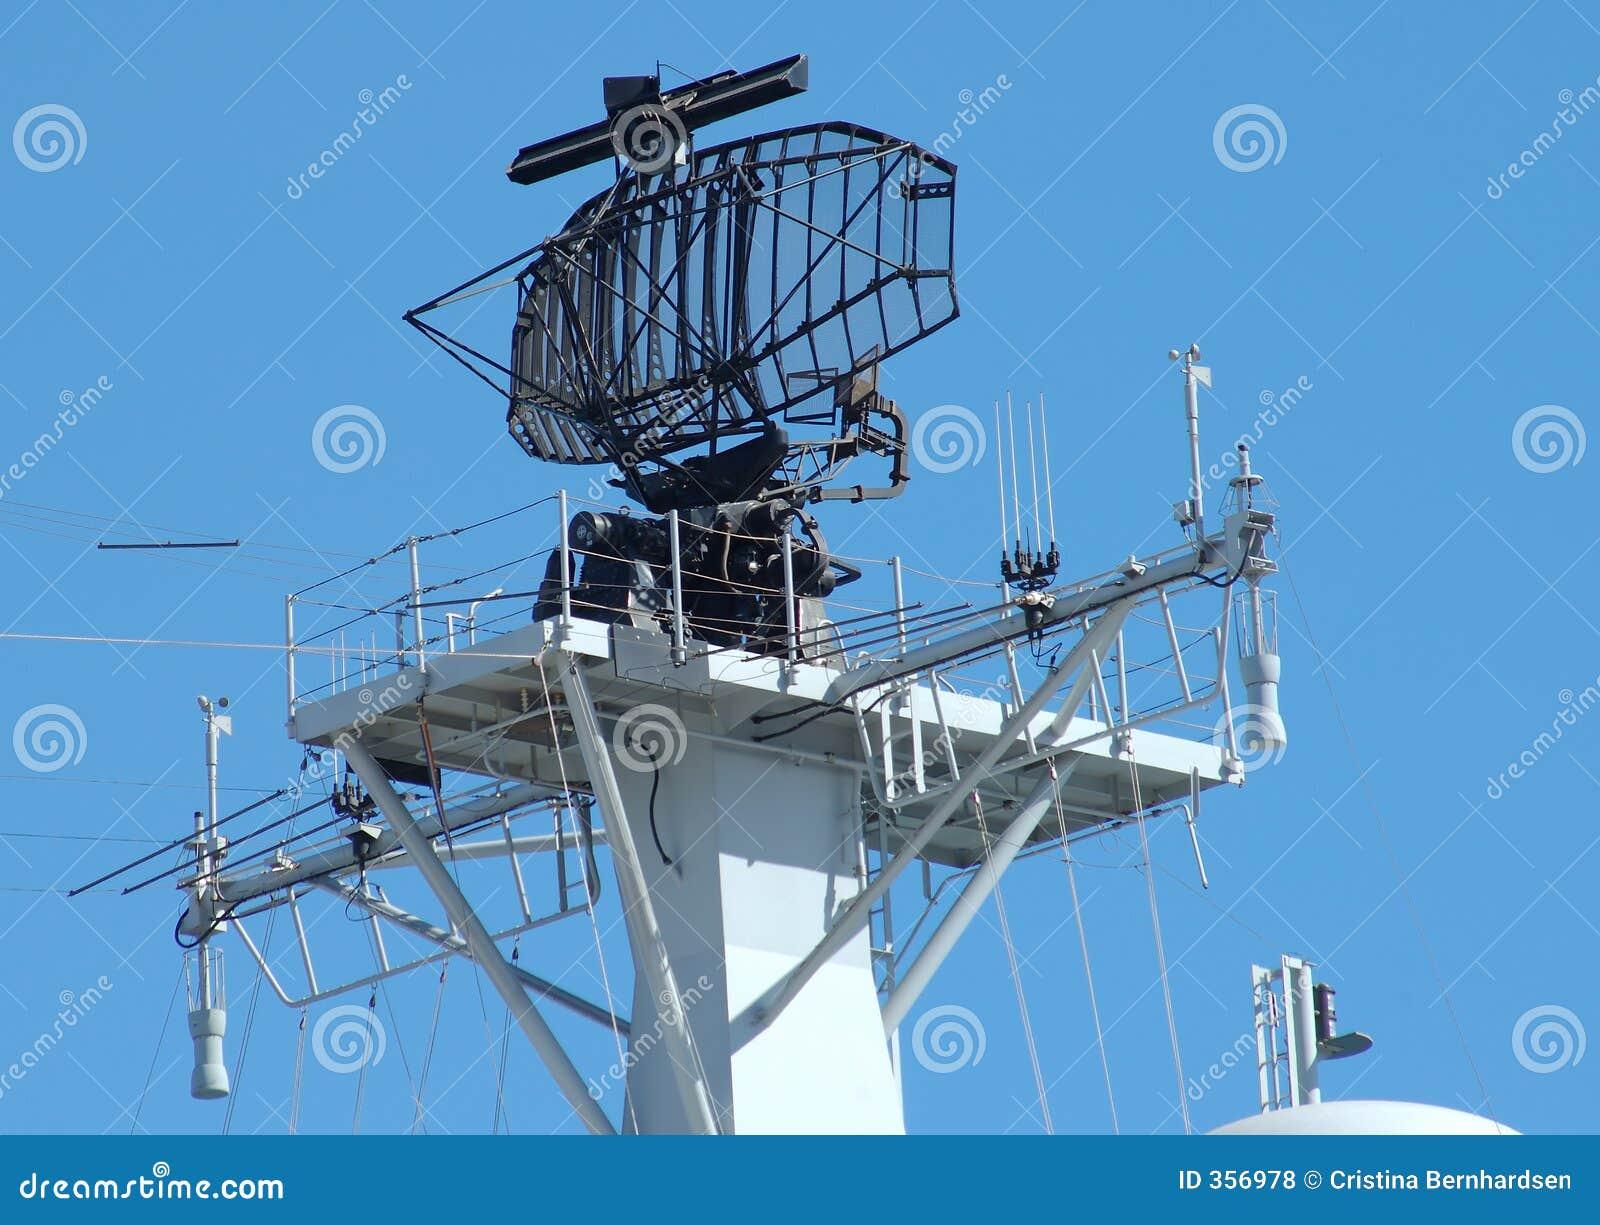 Ship Radar Royalty Free Stock Photos - Image: 356978